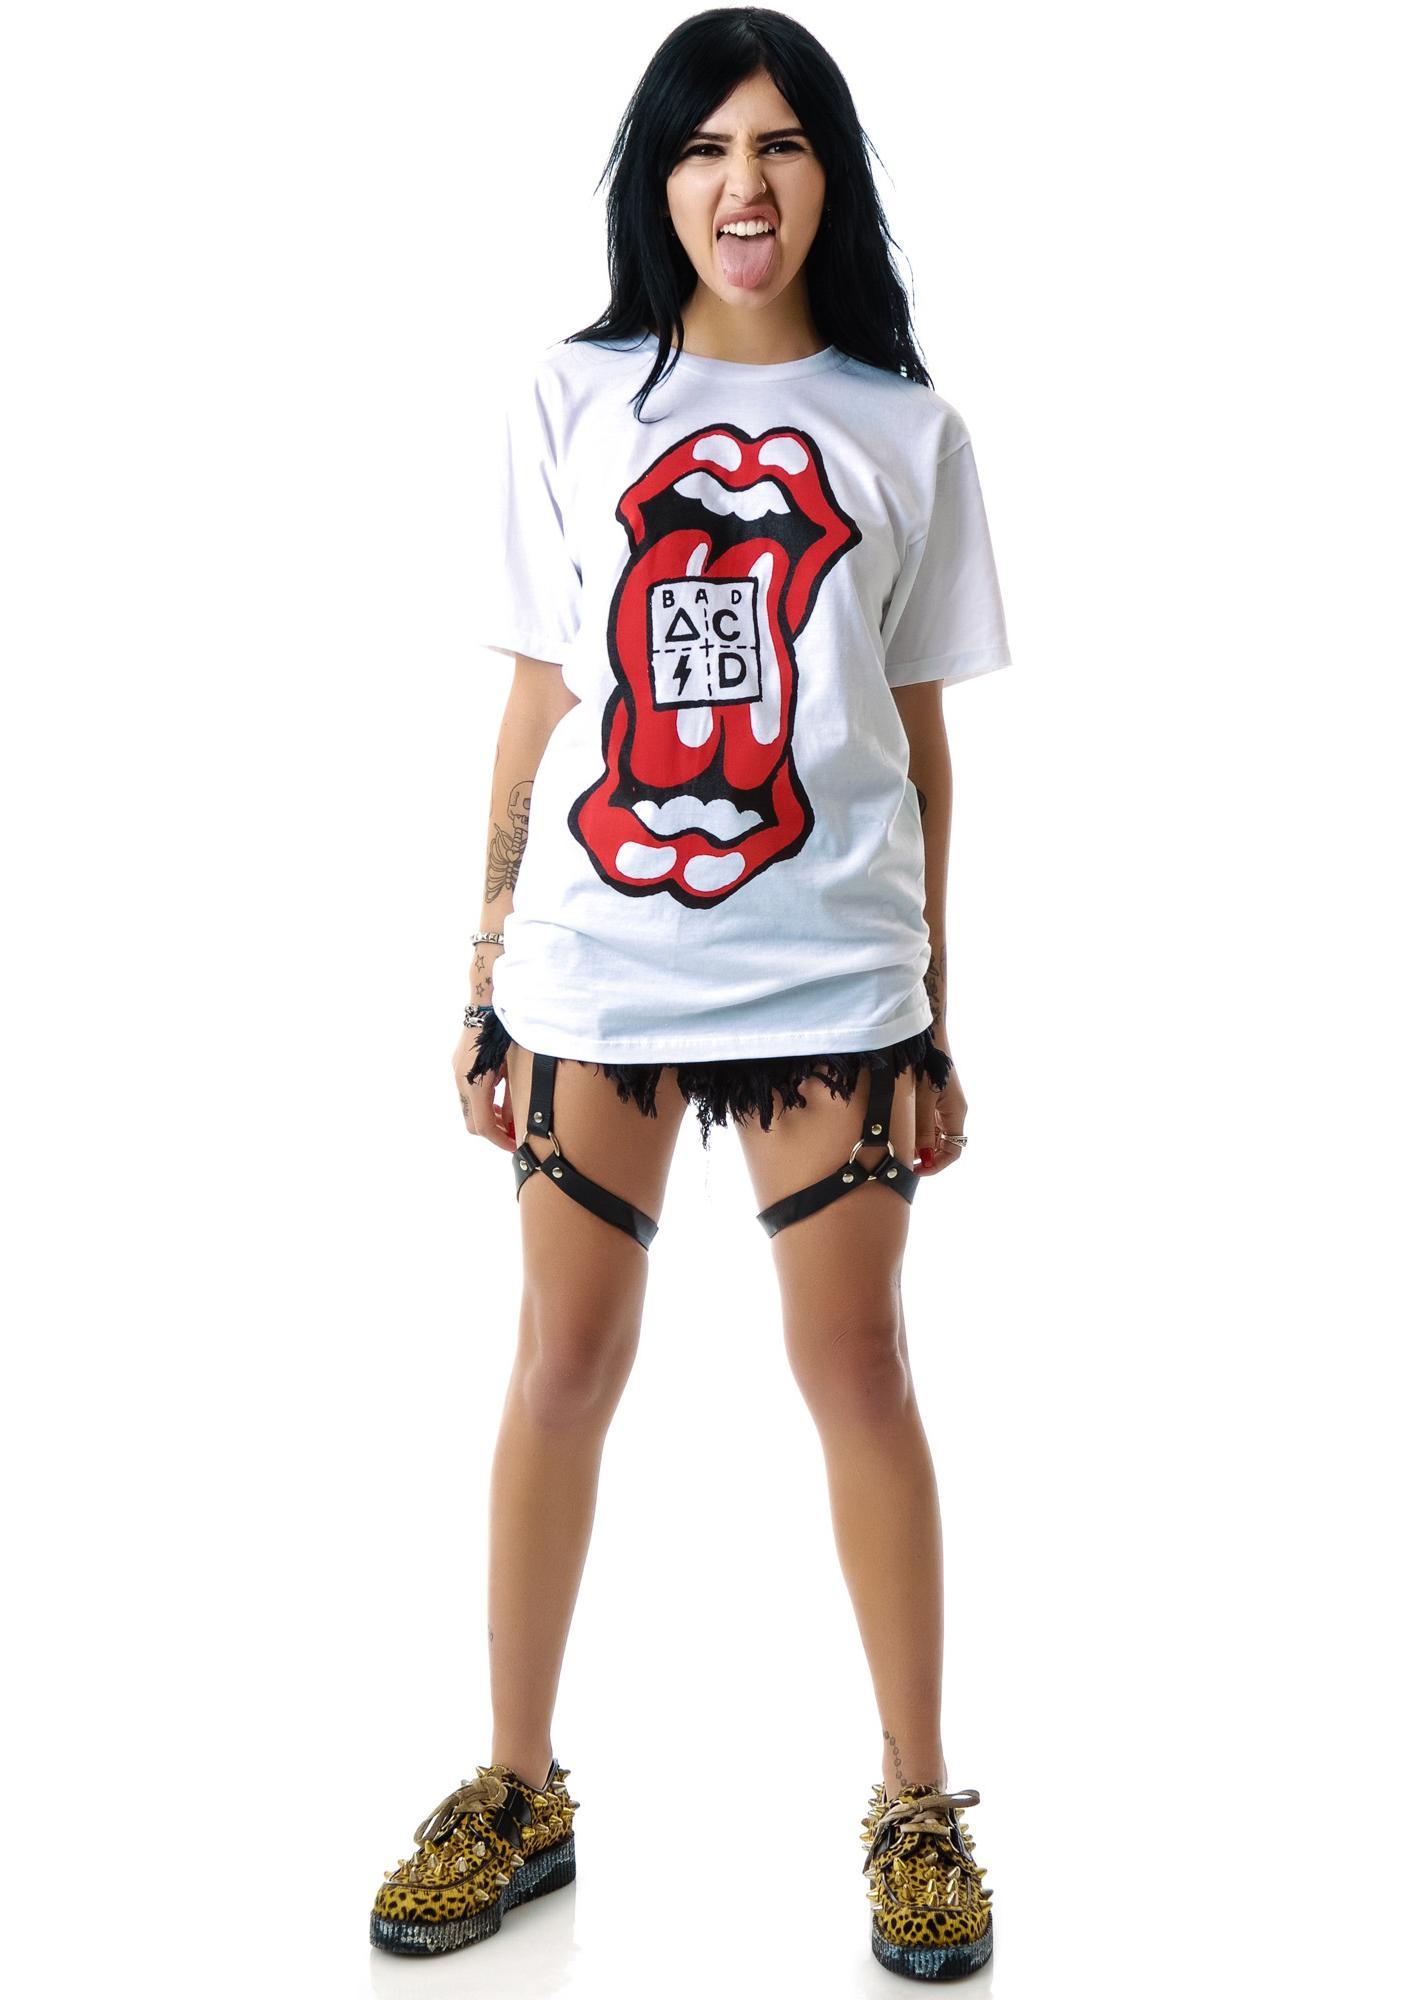 Bad Acid Blotter Shirt